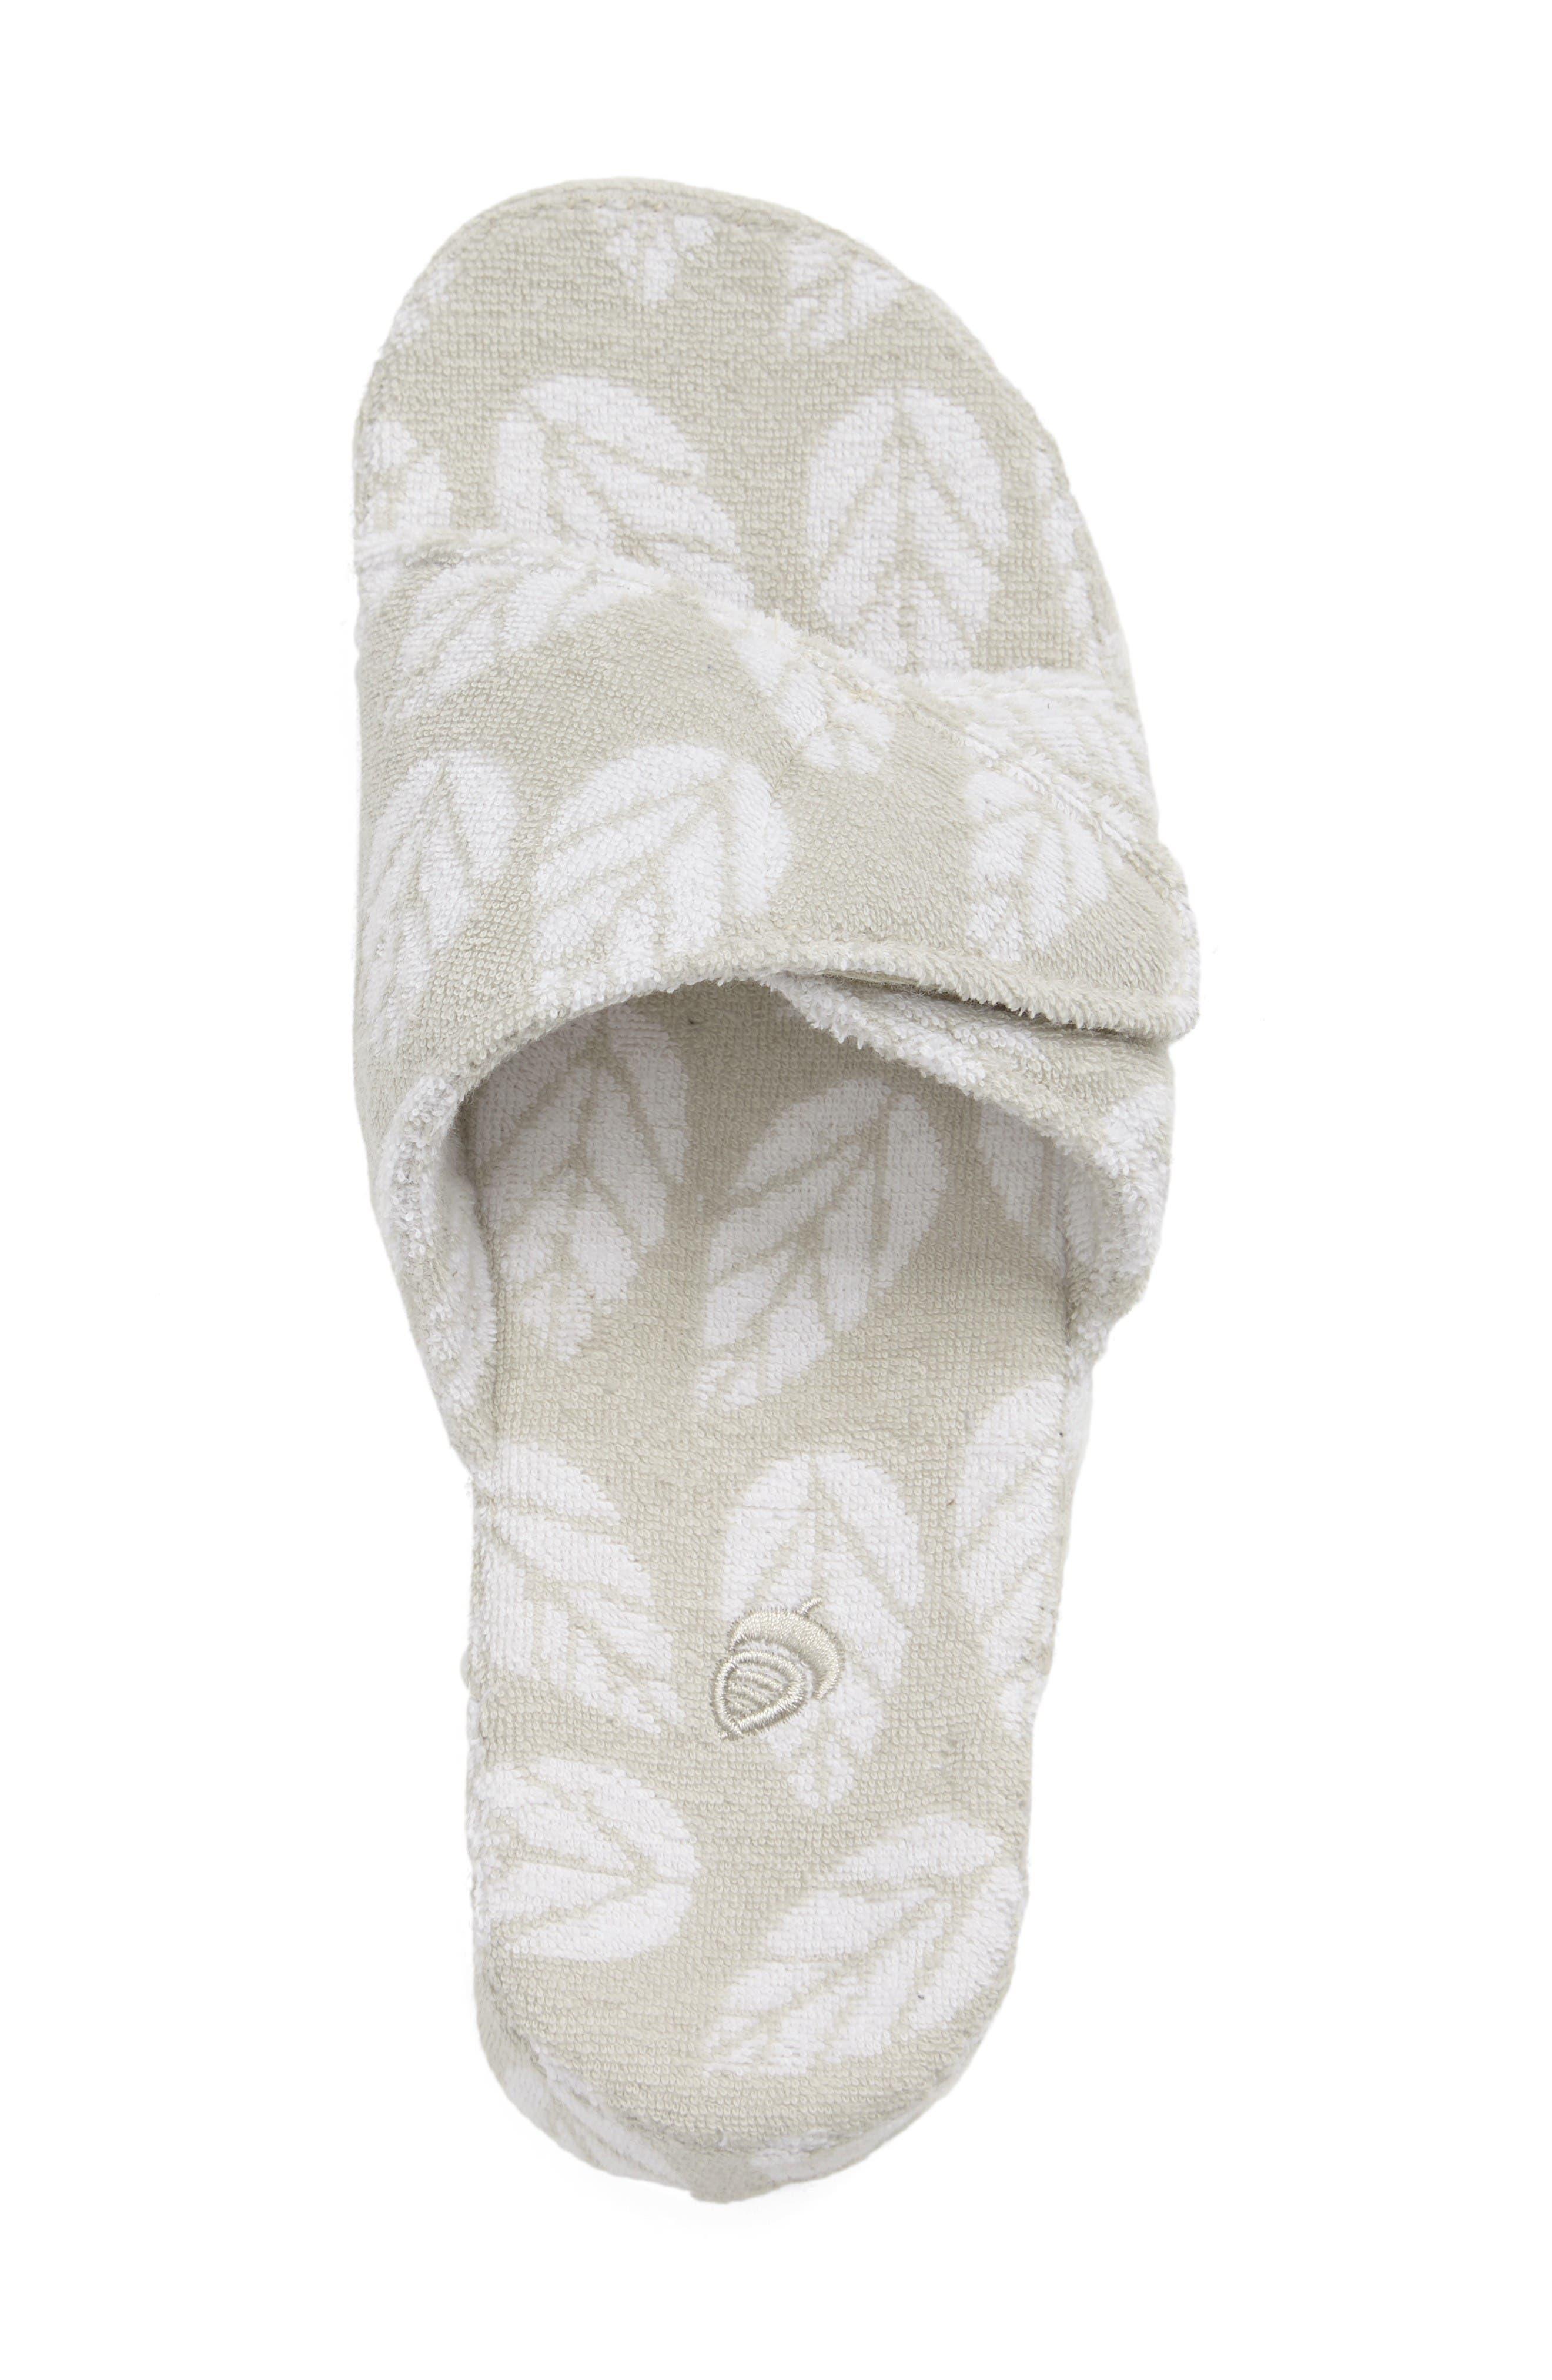 Summerweight Slide Spa Slipper,                             Alternate thumbnail 3, color,                             Grey Leaf Fabric